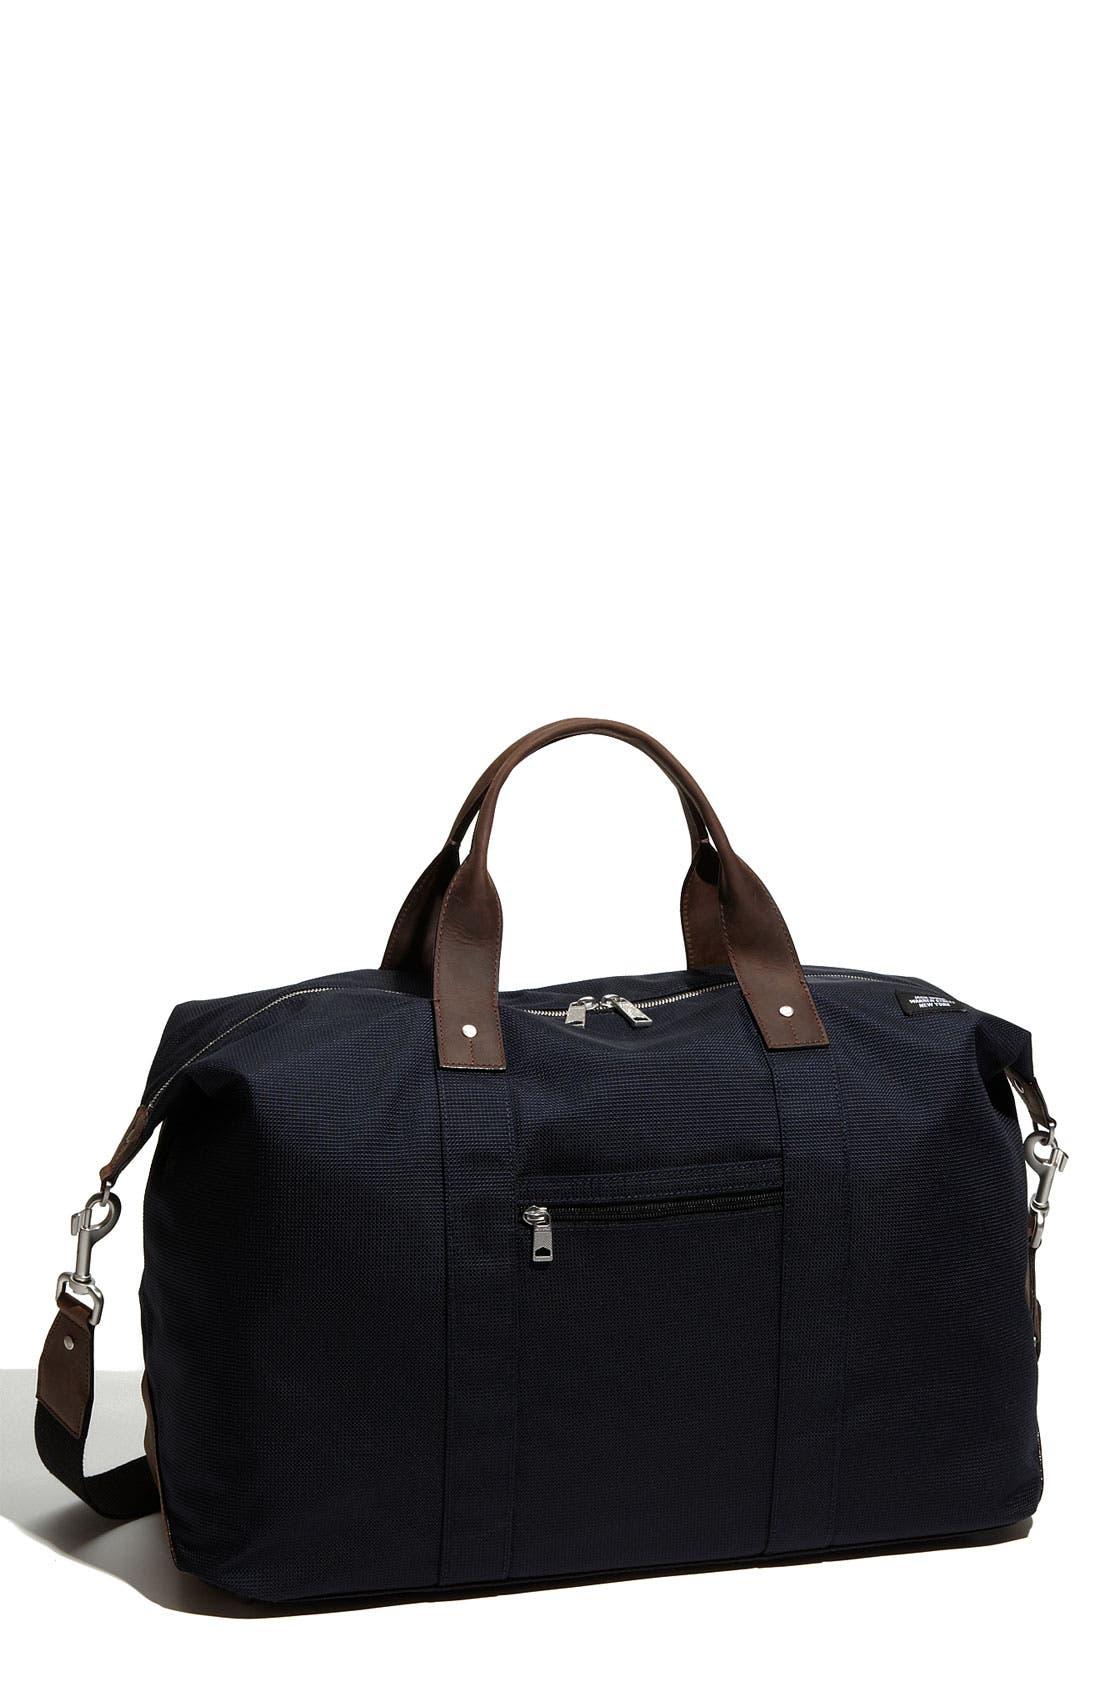 Main Image - Jack Spade 'Wing' Nylon Duffel Bag